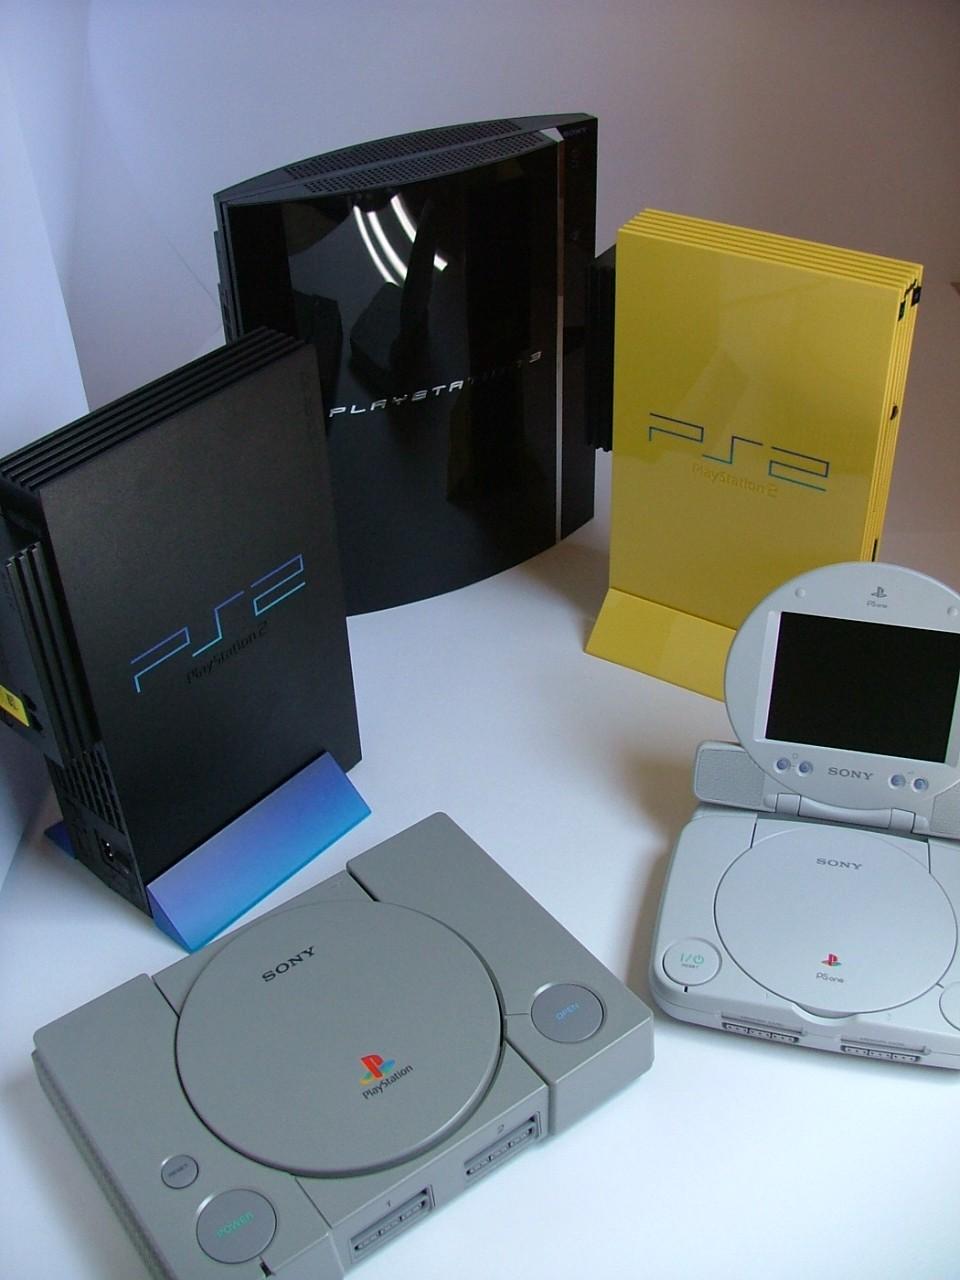 PlayStation (konsol) - Wikipedia bahasa Indonesia